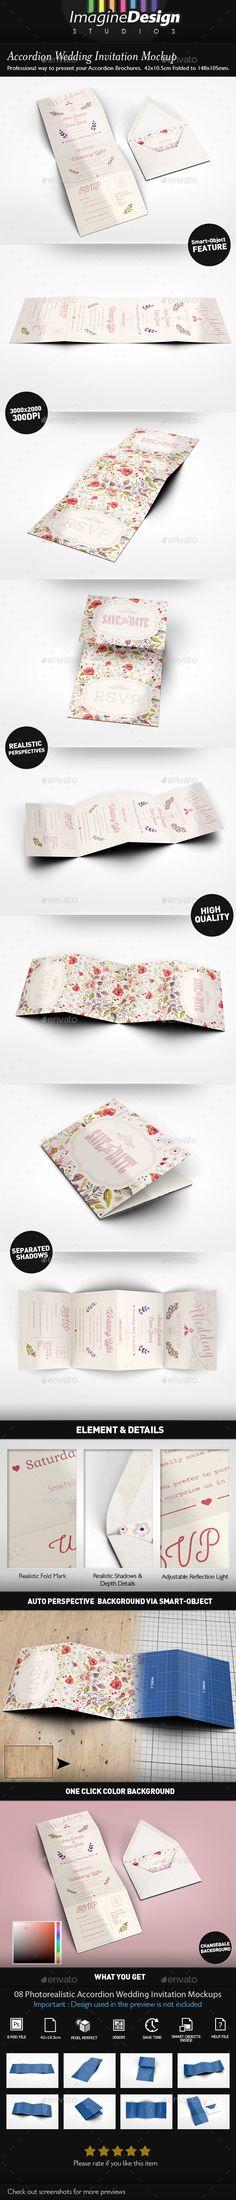 Accordion Wedding Invitation Mockup — Photoshop PSD #accordion fold #invitation mockup • Download ➝ https://graphicriver.net/item/accordion-wedding-invitation-mockup/18765505?ref=pxcr